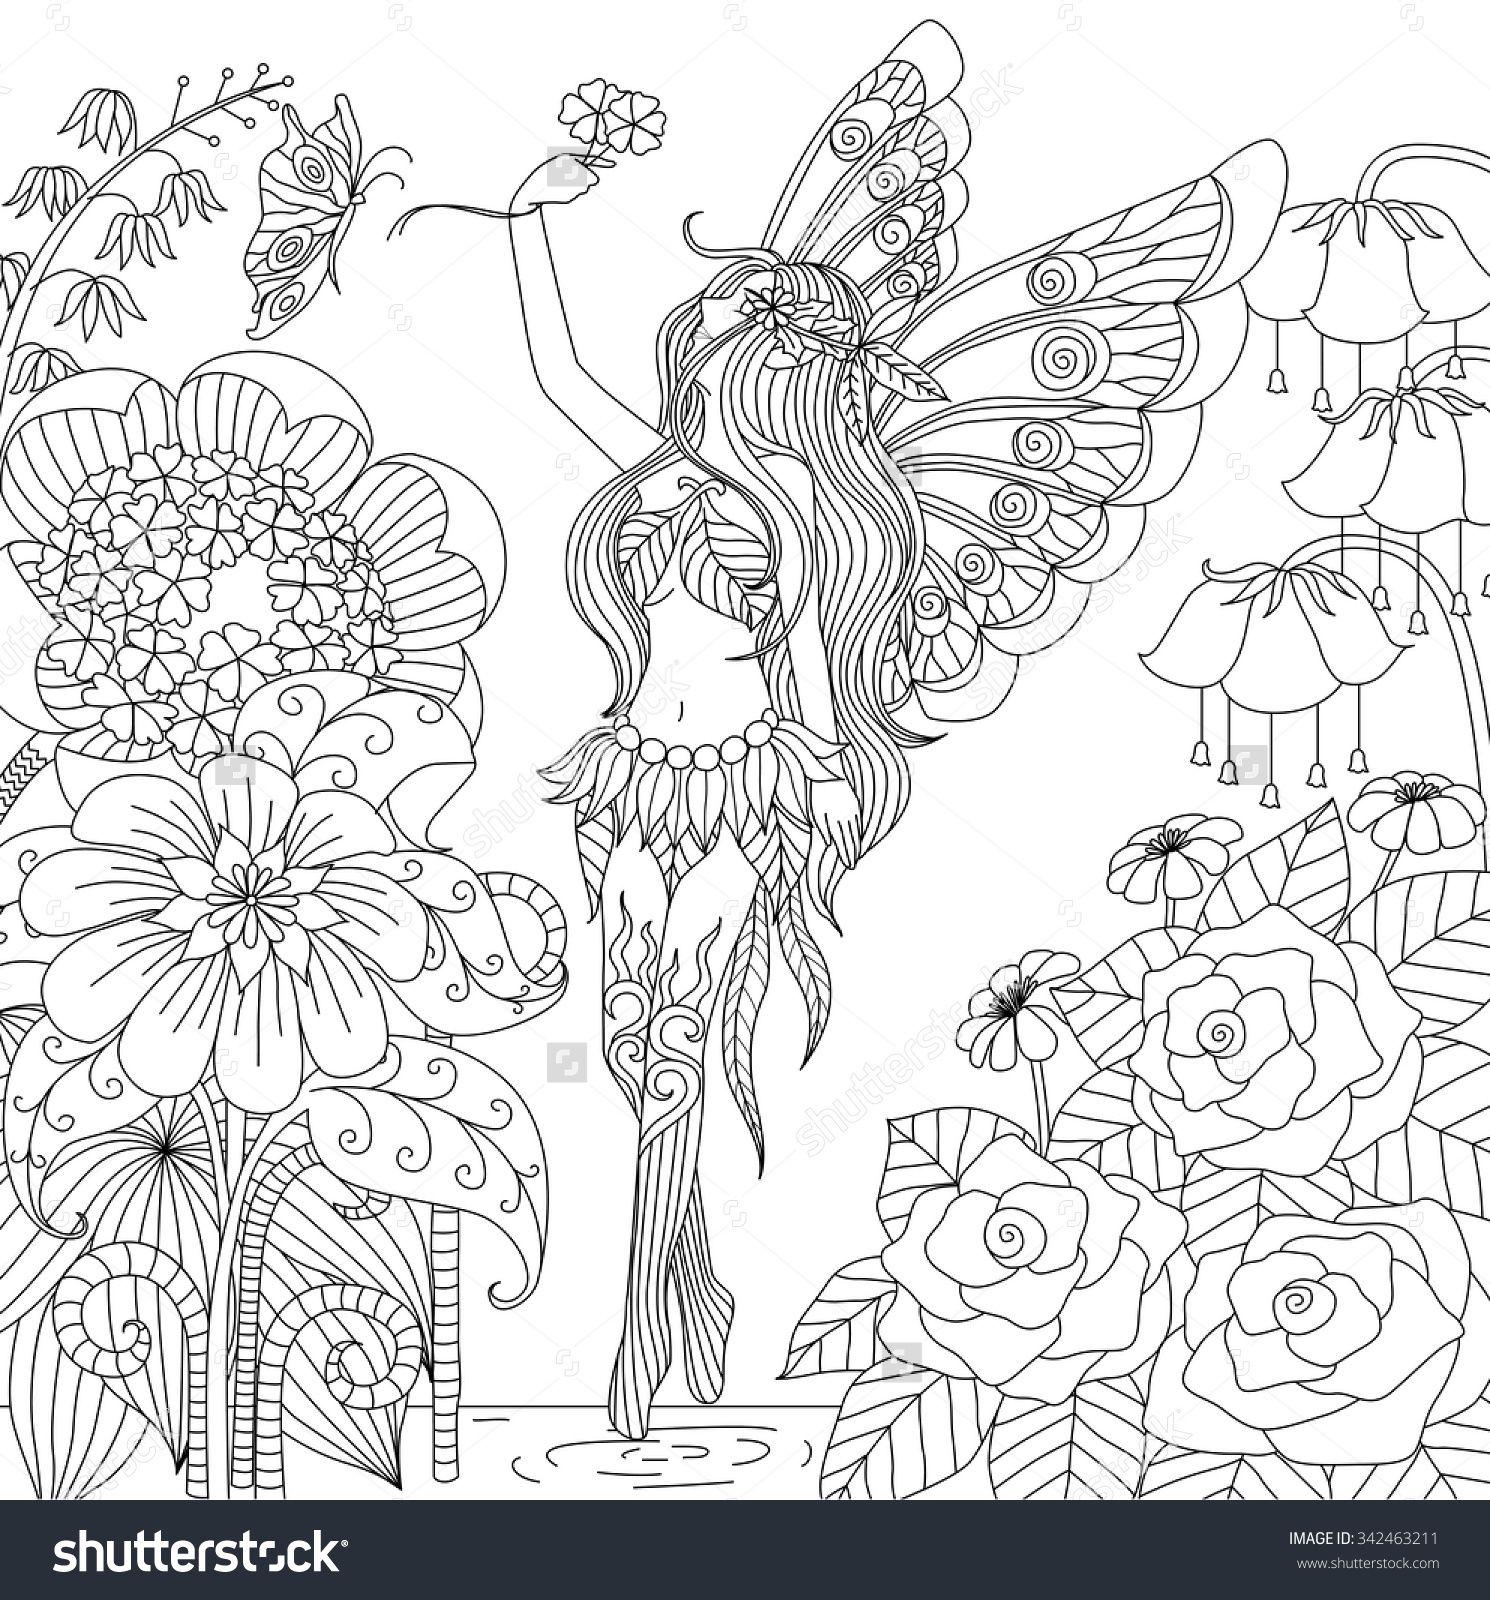 Resultado de imagem para fairies coloring book